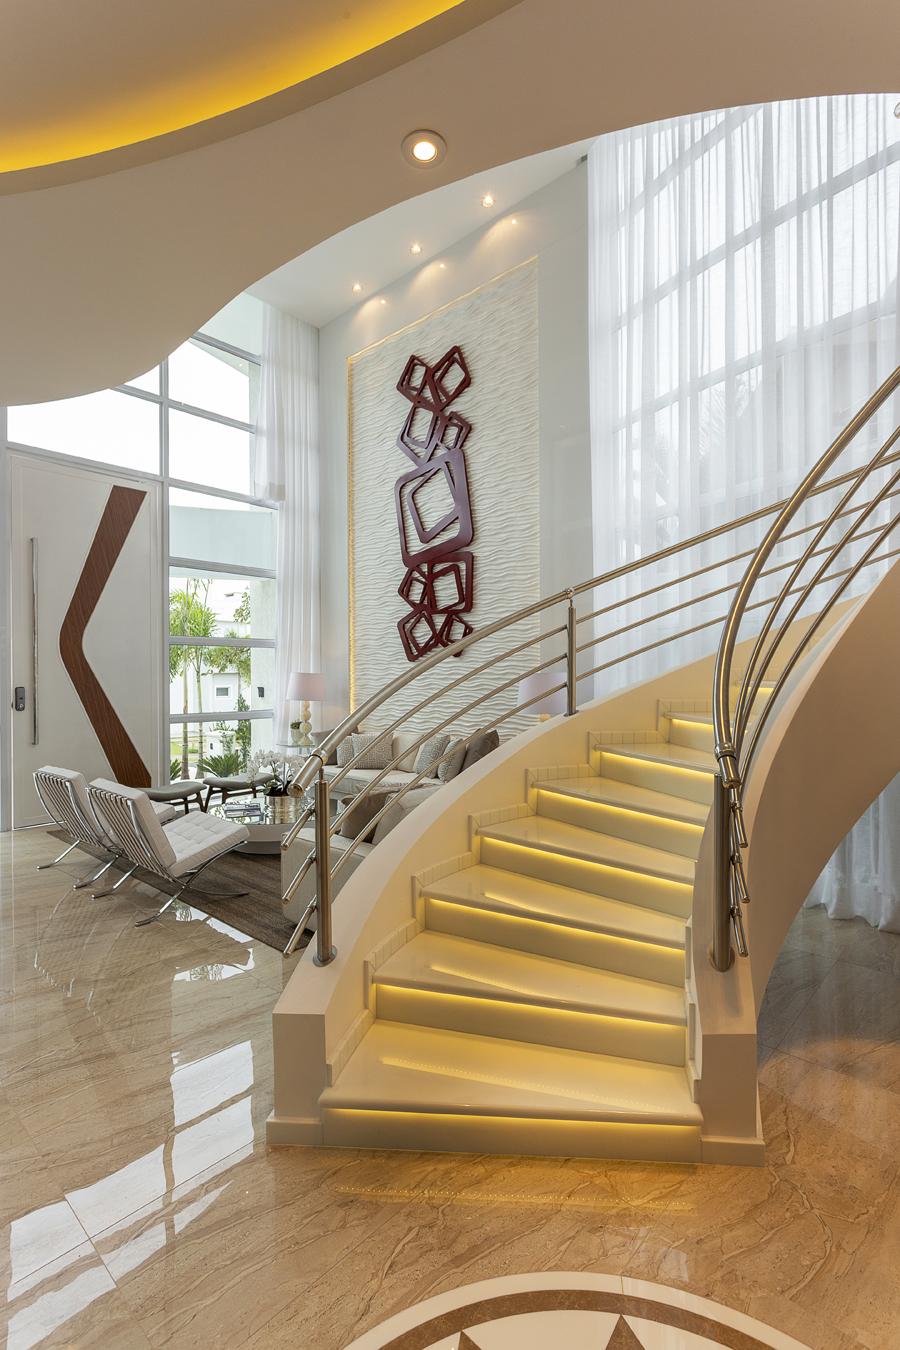 Aquiles Nícolas Kilaris - Casa Esplêndida - luz escada